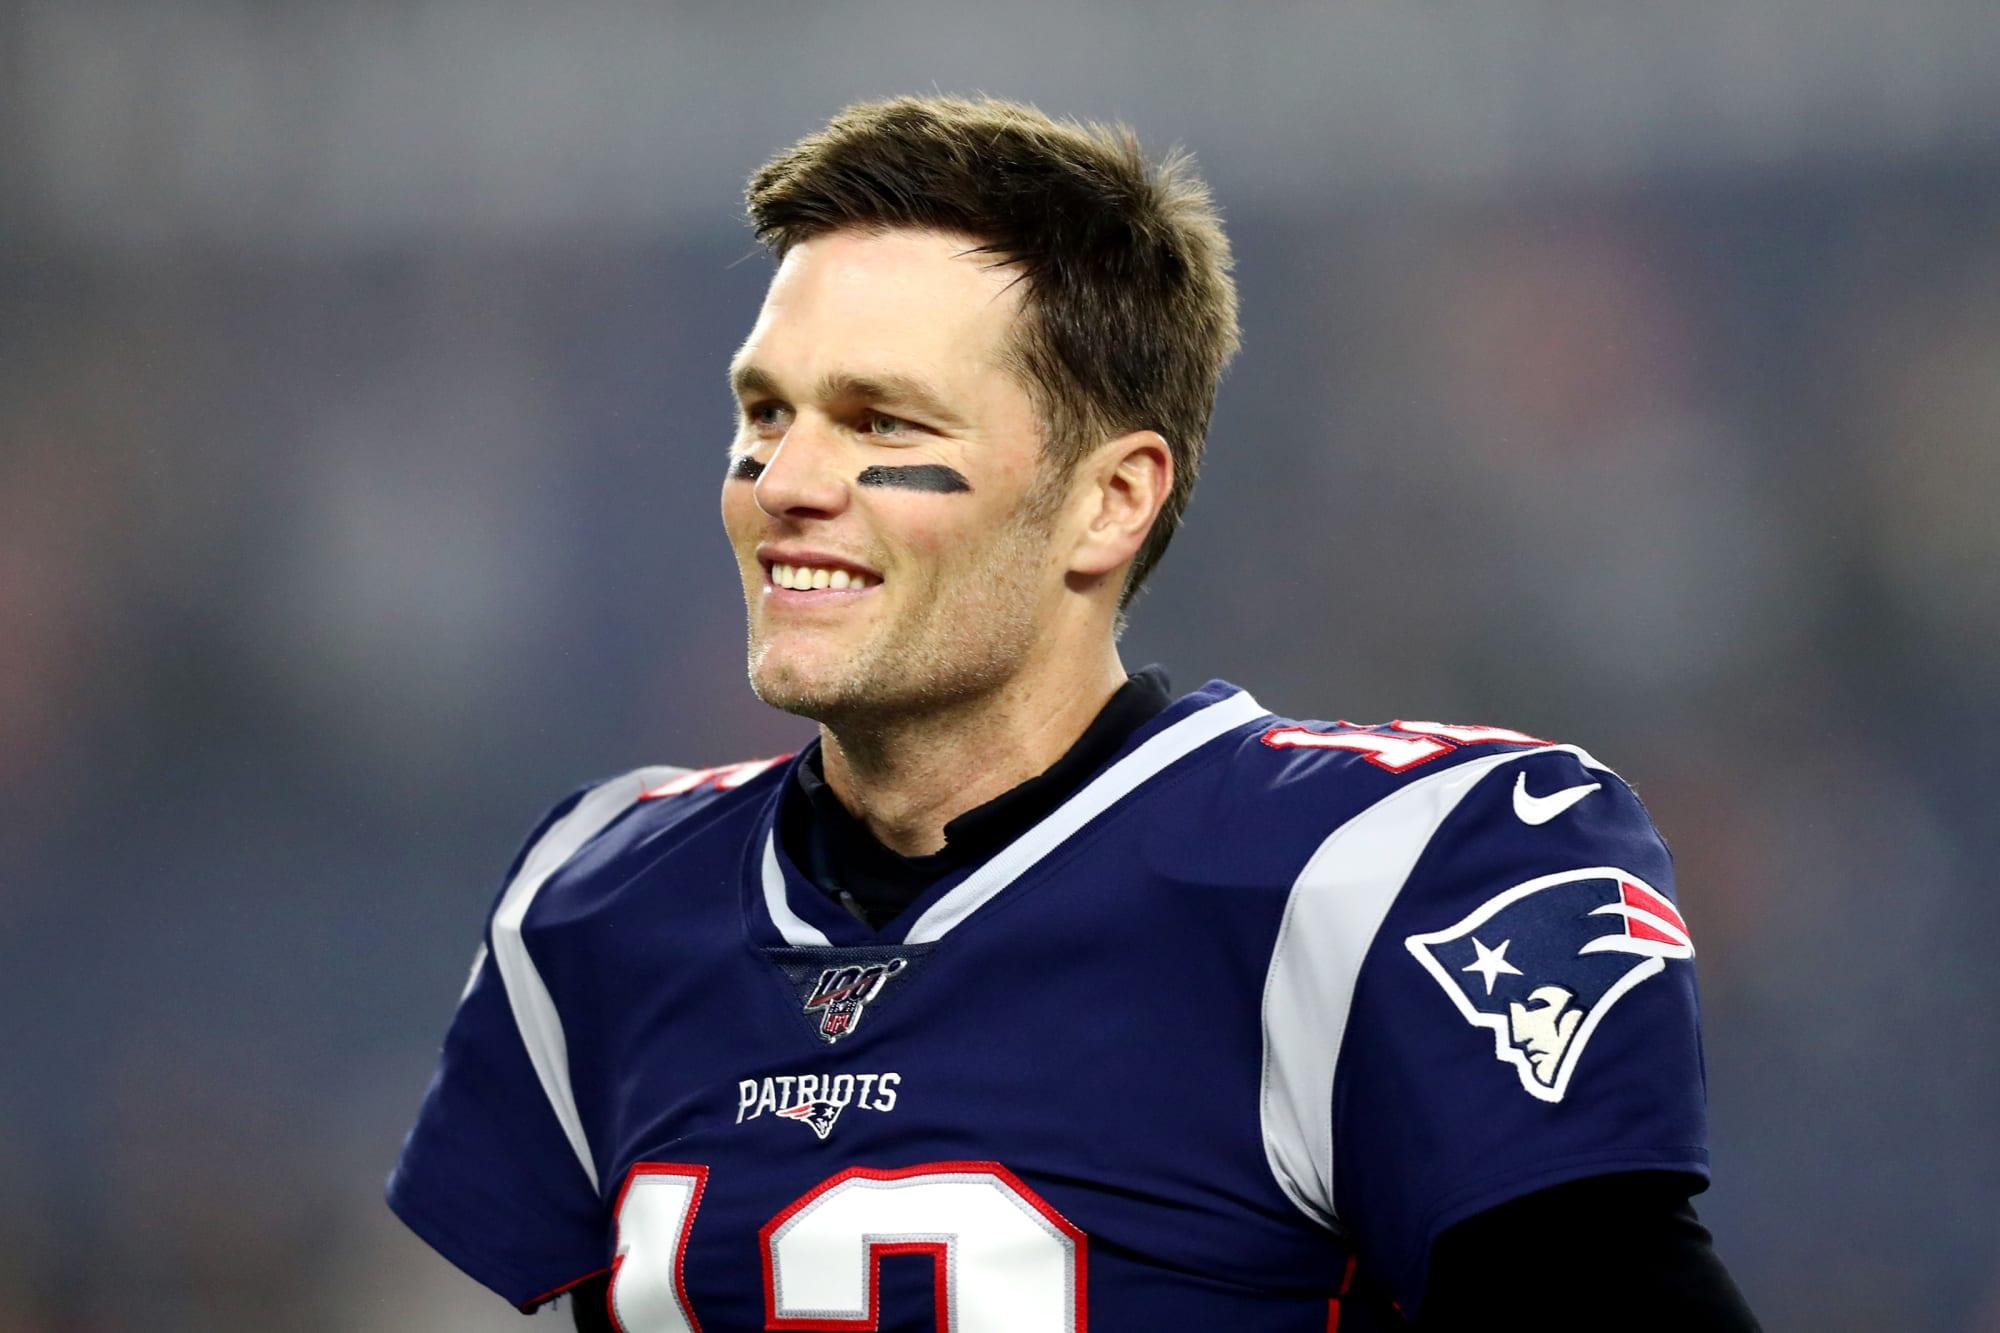 The secret to Tom Brady's success is still having an iPhone 6 Plus